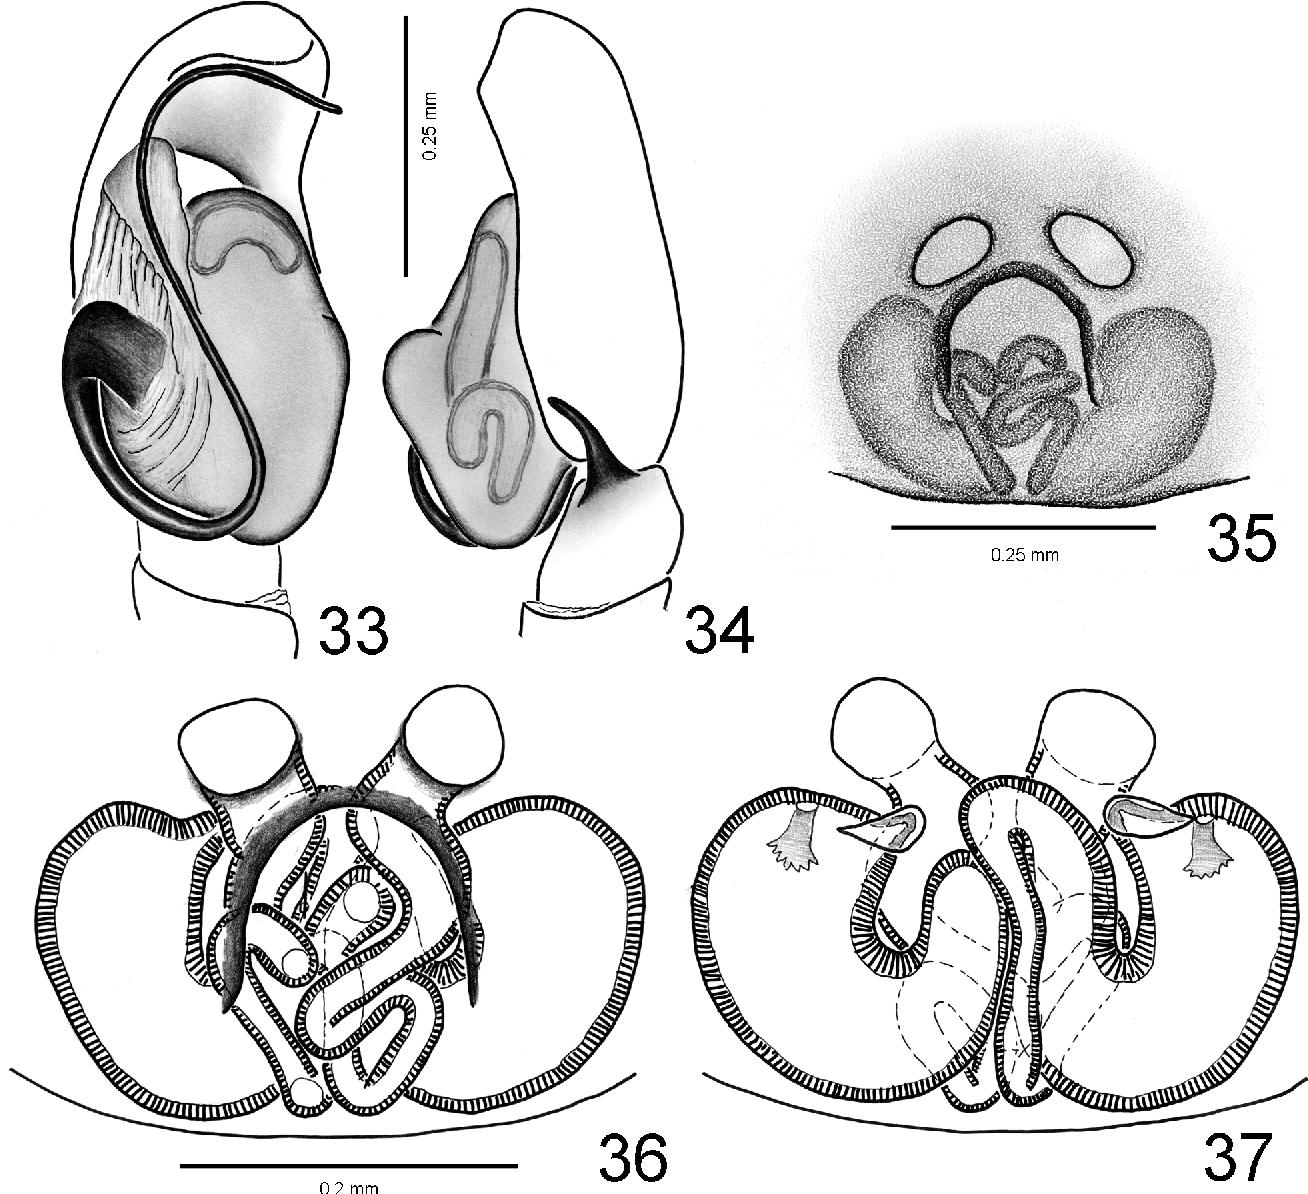 figure 29‒37